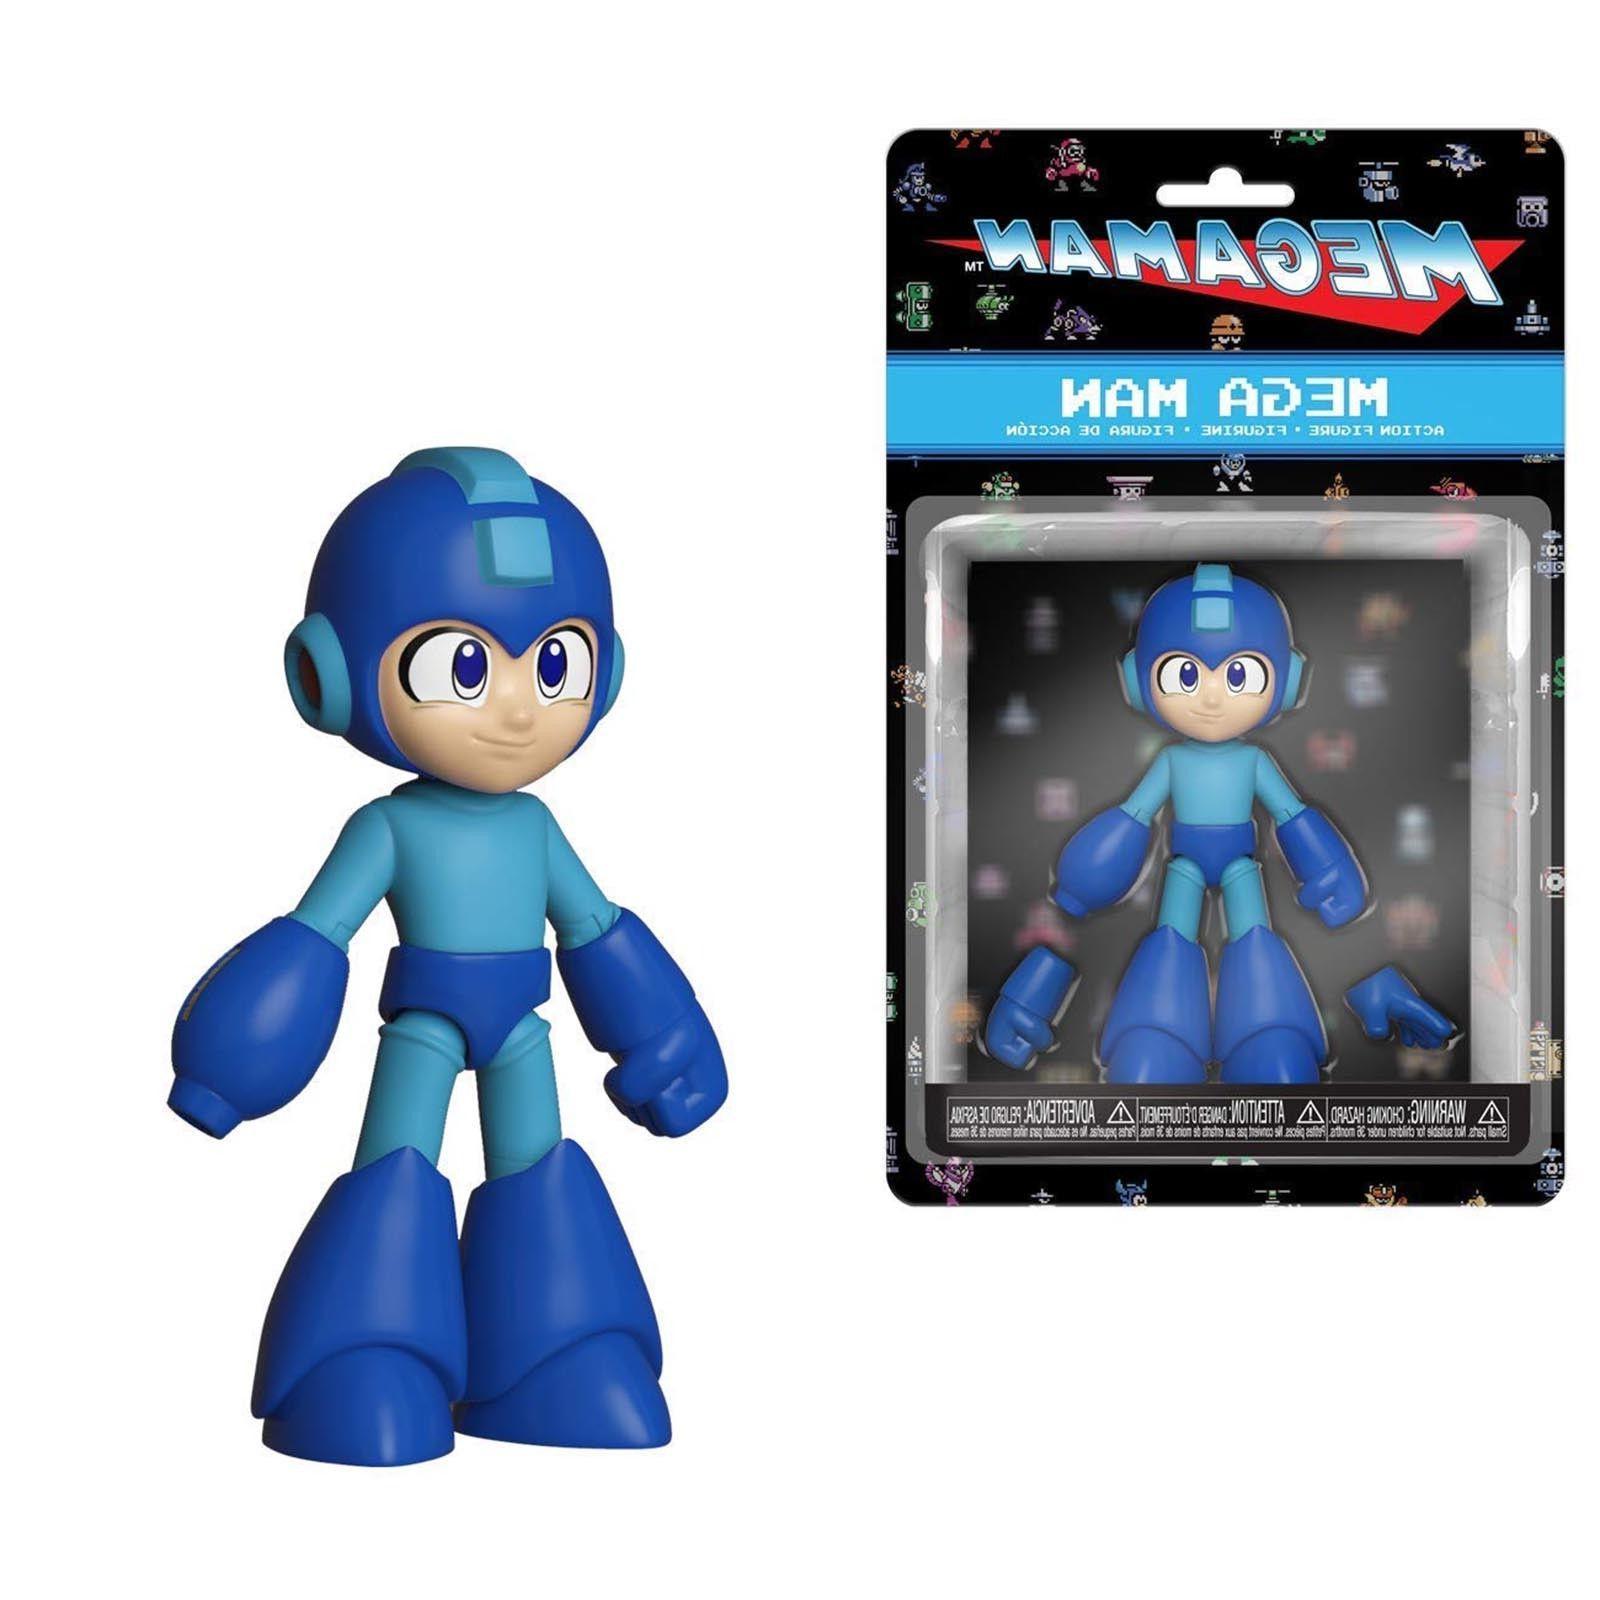 mega man 4 5 inch action figure